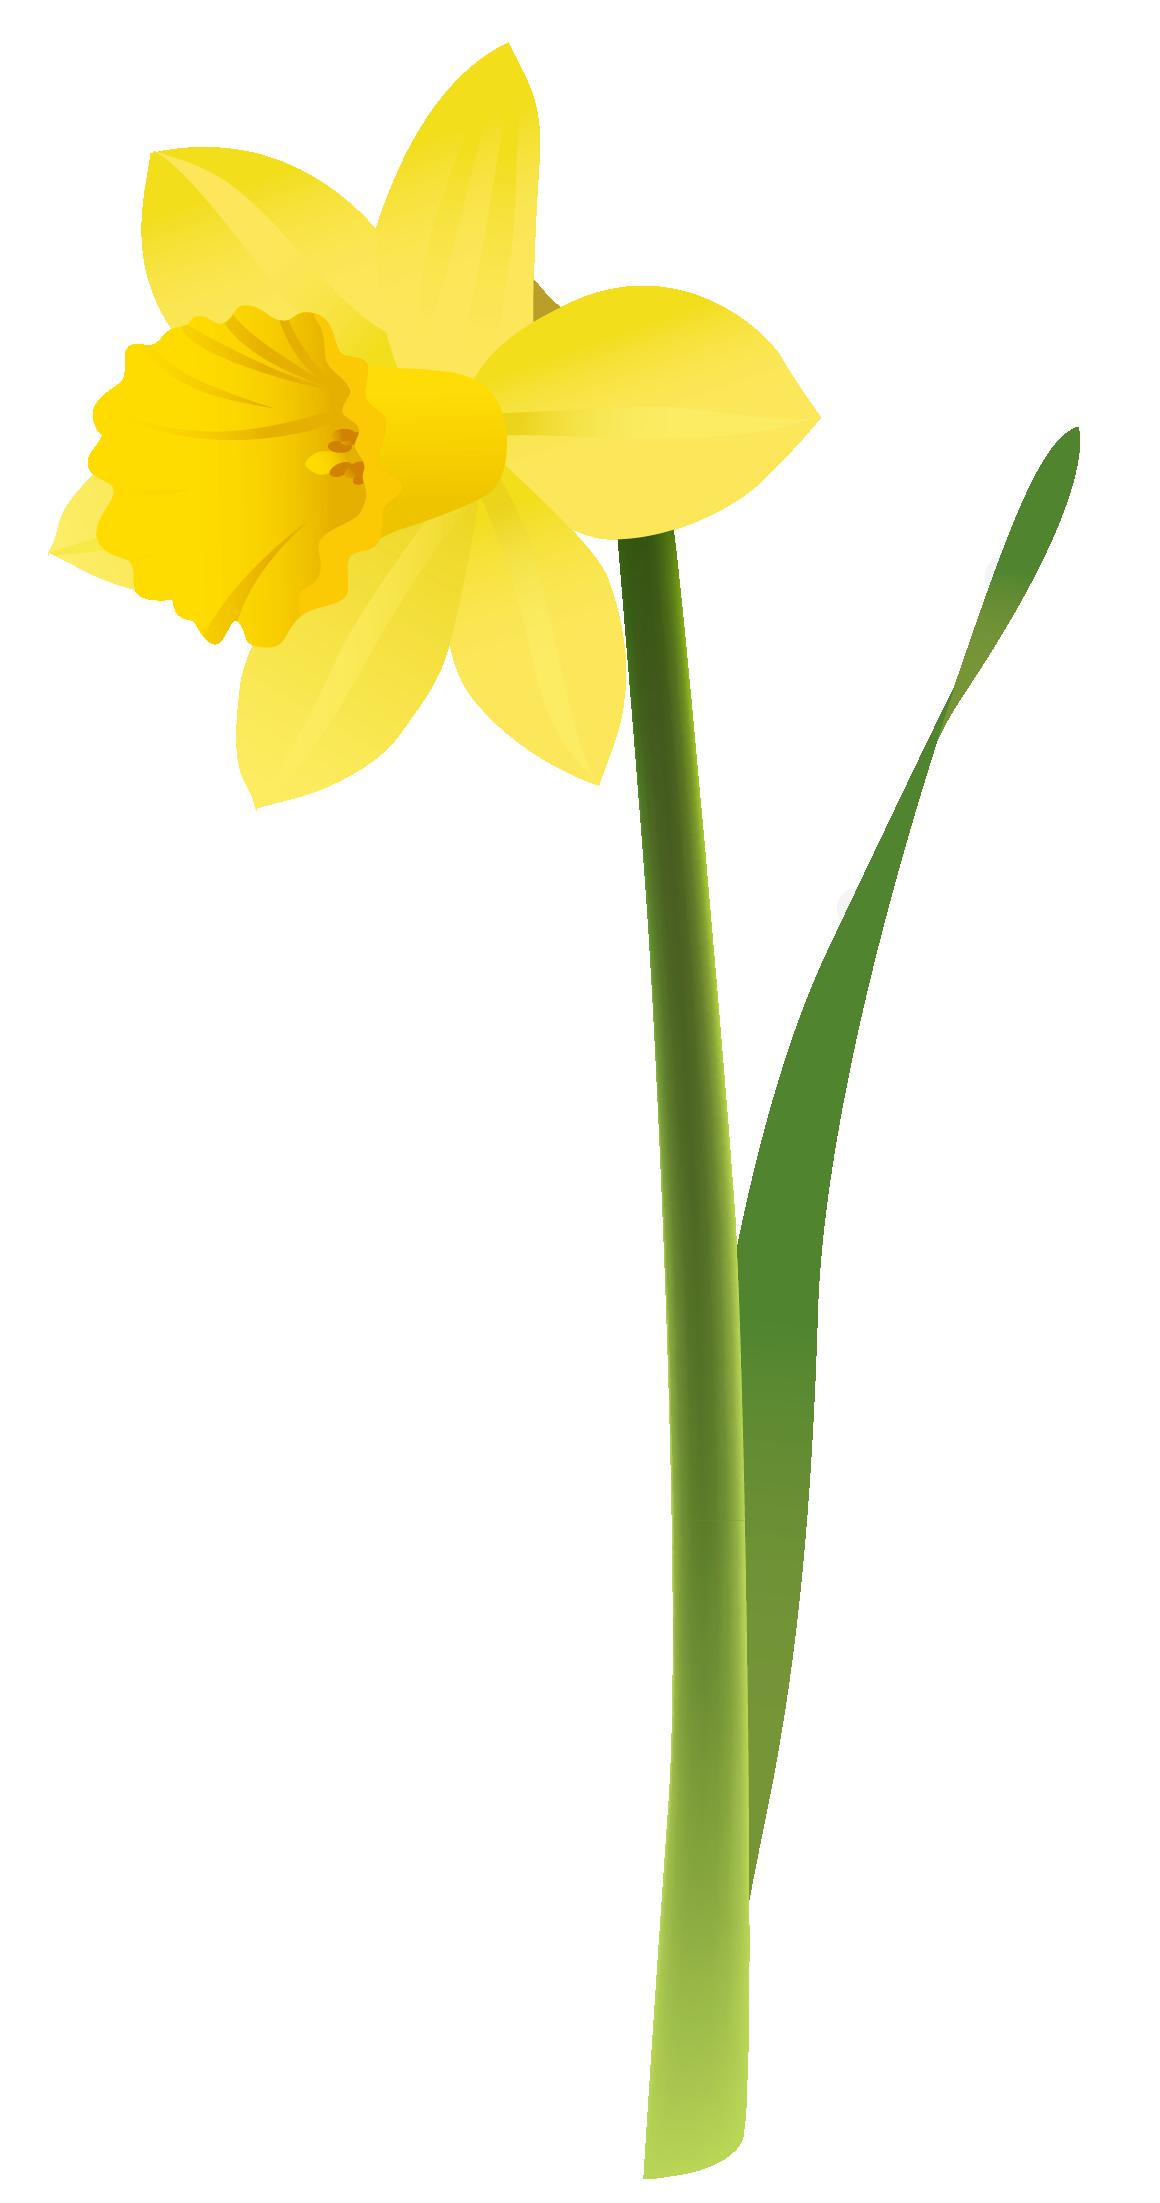 Clip Art · Yellow Daffodils Clipart-Clip art · Yellow Daffodils Clipart-3